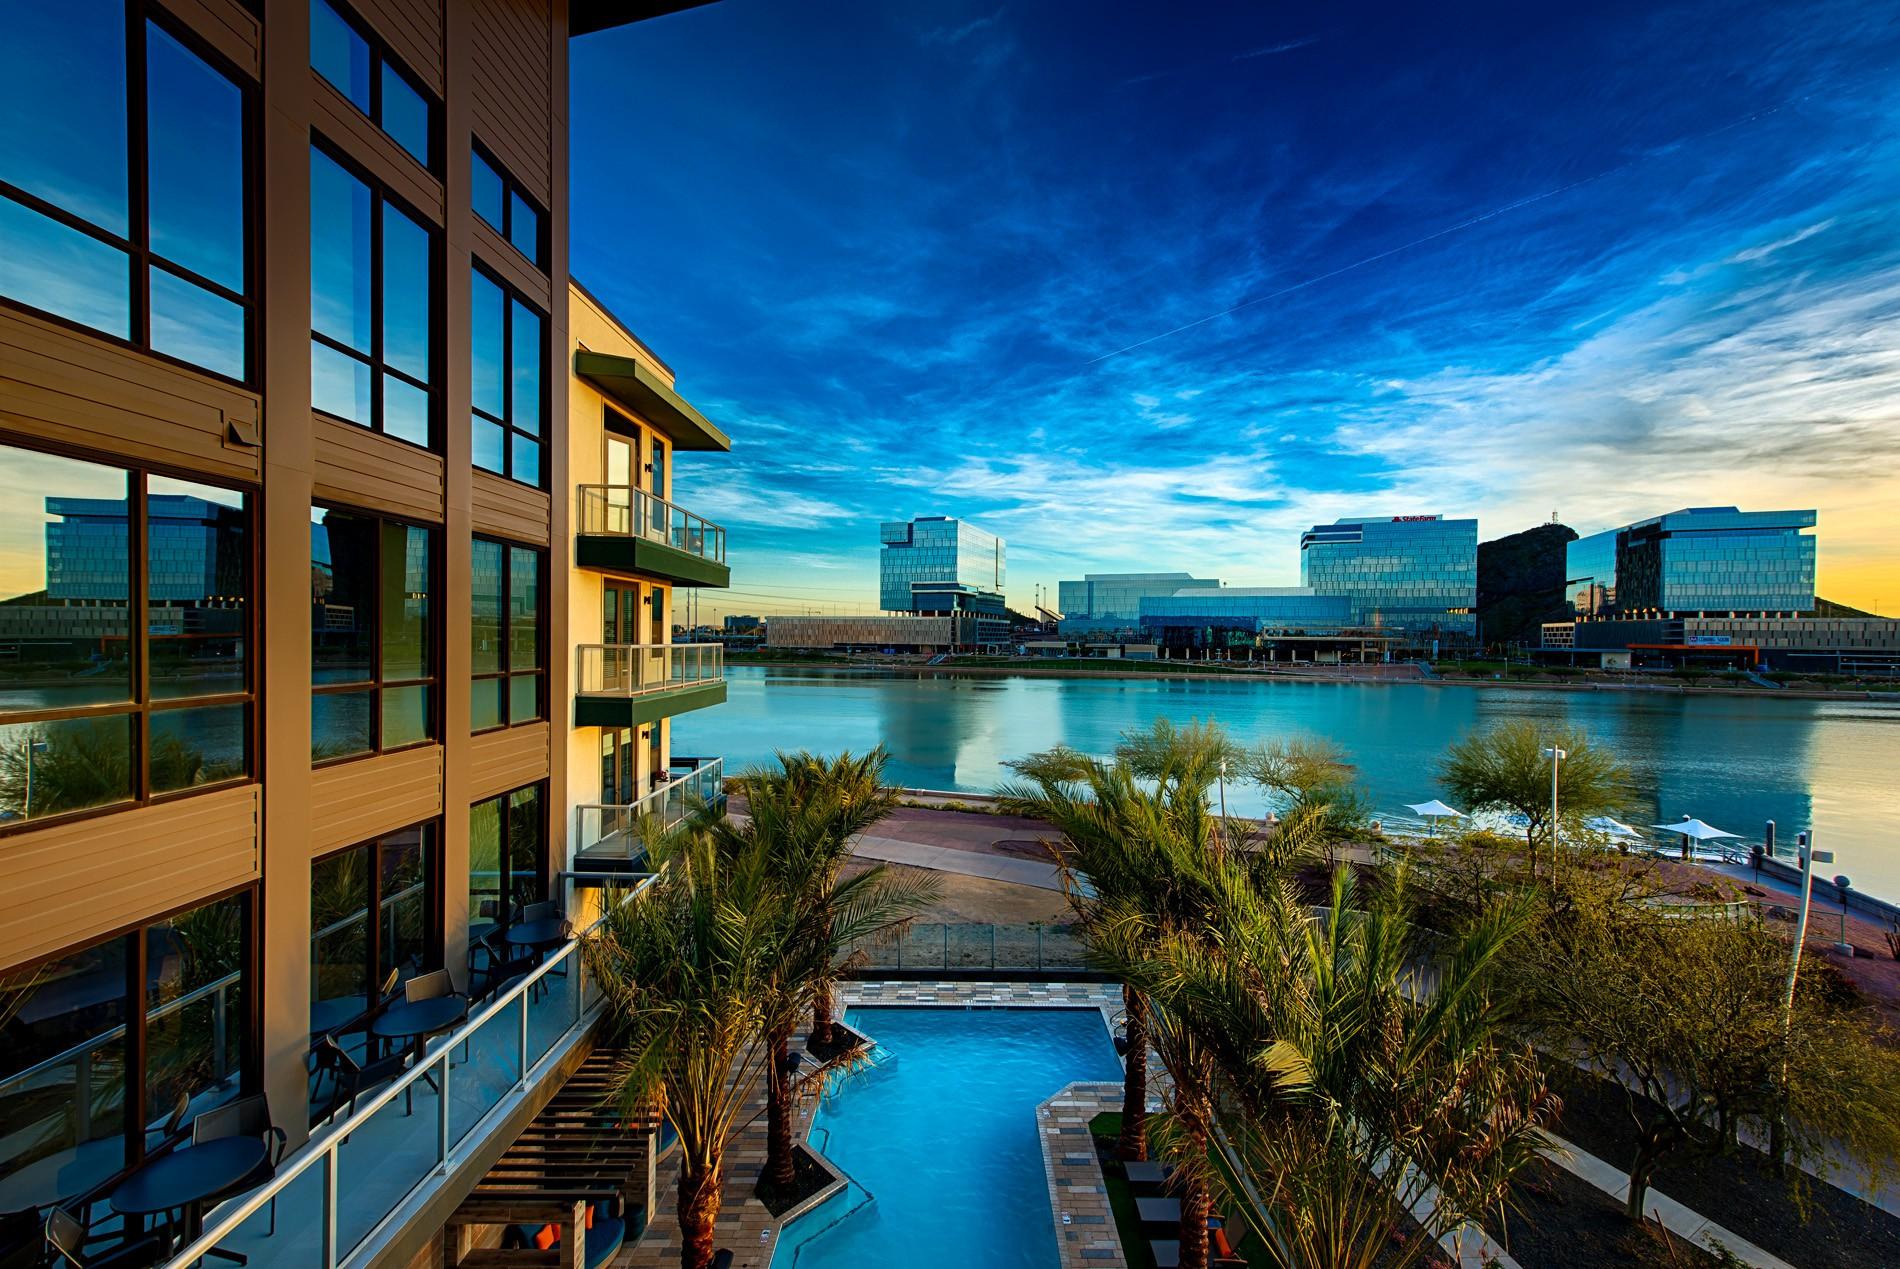 Apartments Near ASU Vela Luxury Apartment Homes for Arizona State University Students in Tempe, AZ